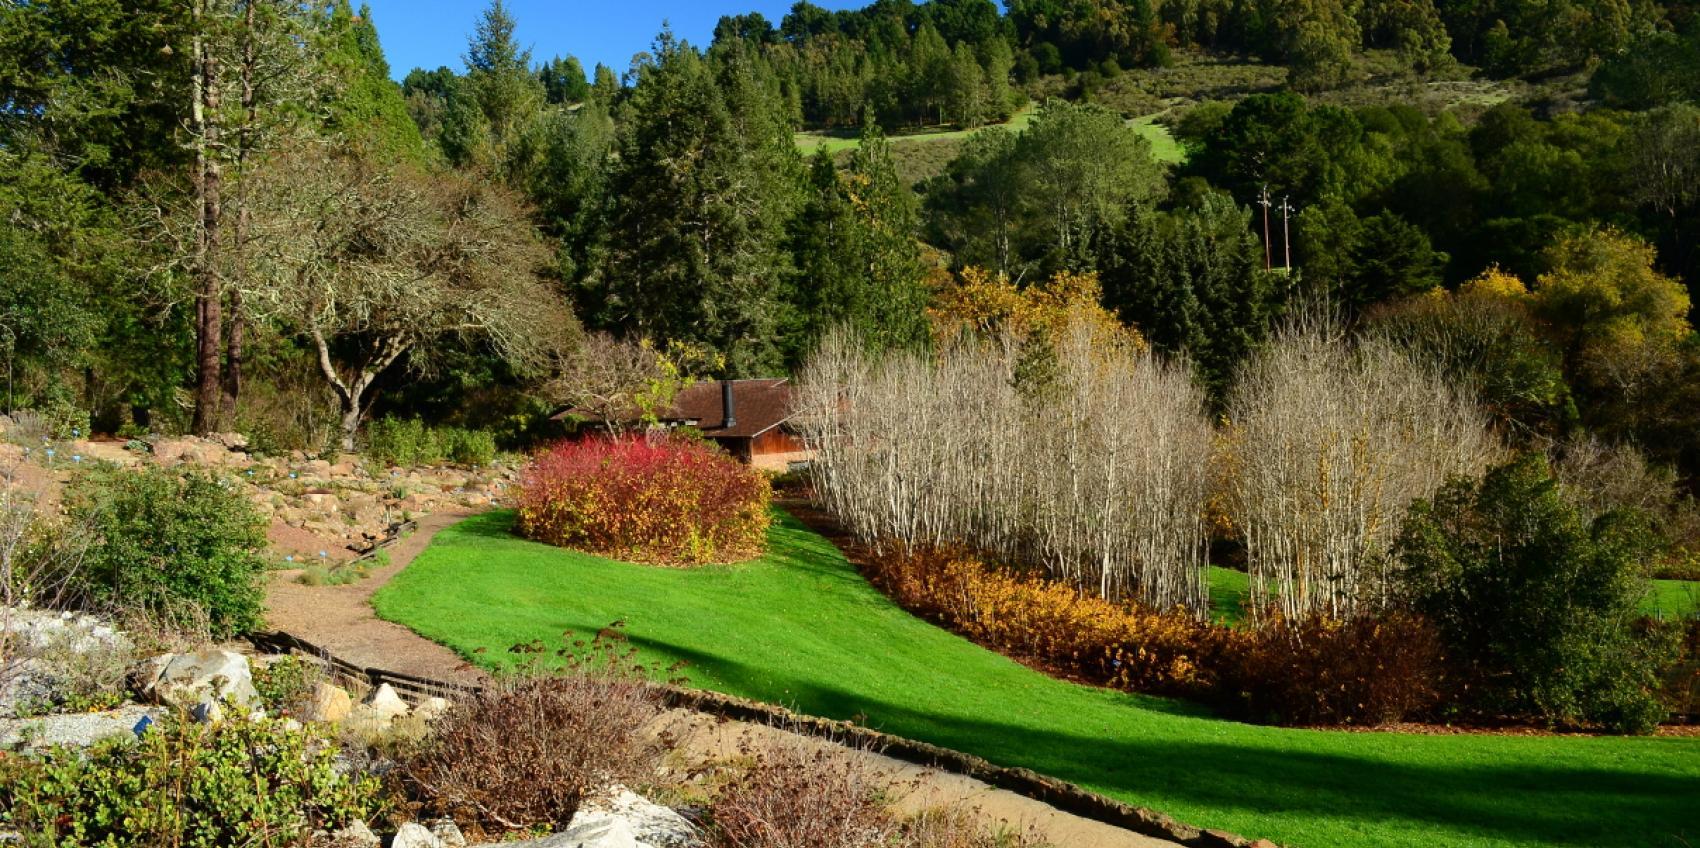 Regional Parks Botanic Garden | American Public Gardens Association